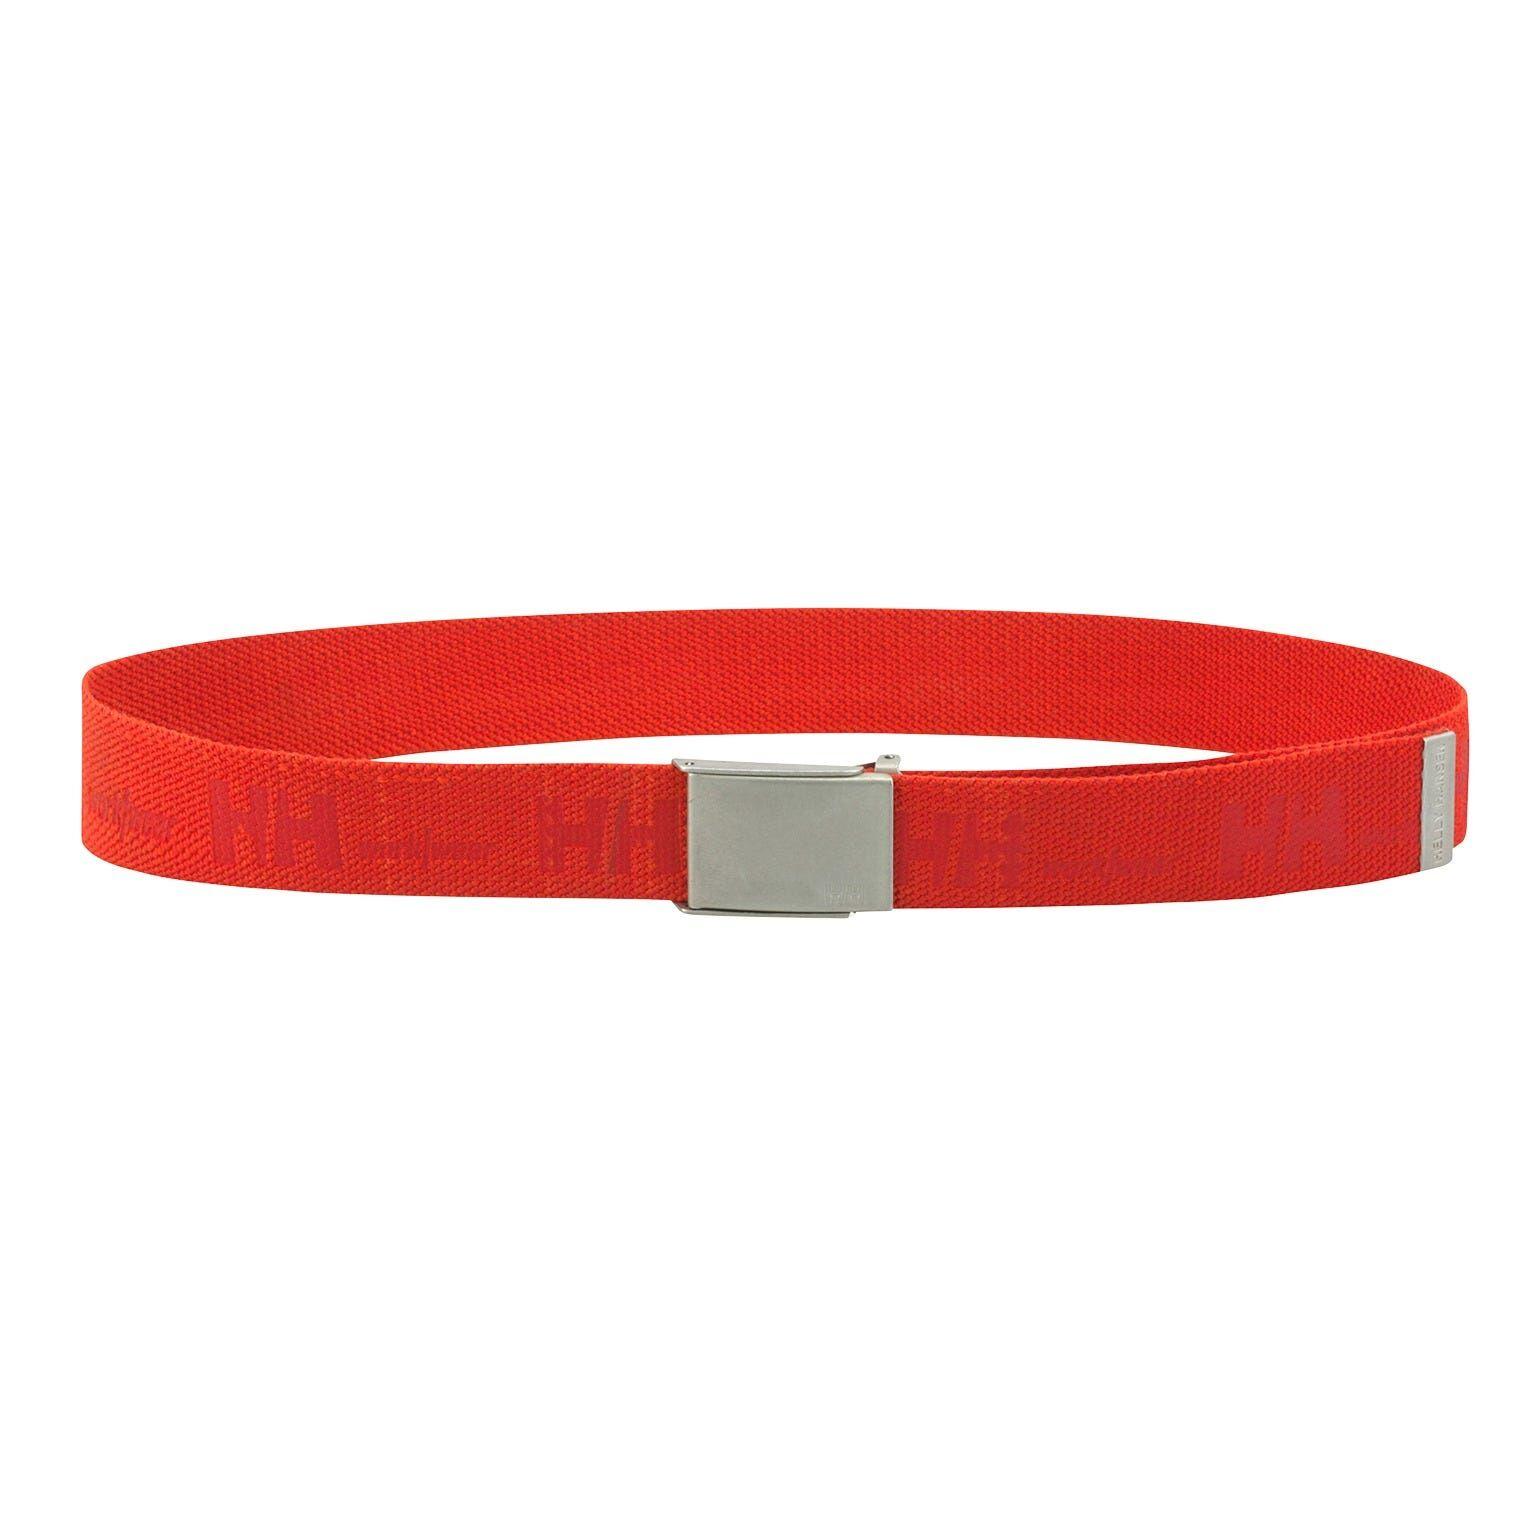 HH Workwear Helly Hansen WorkwearHH Logo Full Stretch Webbing Belt Orange STD